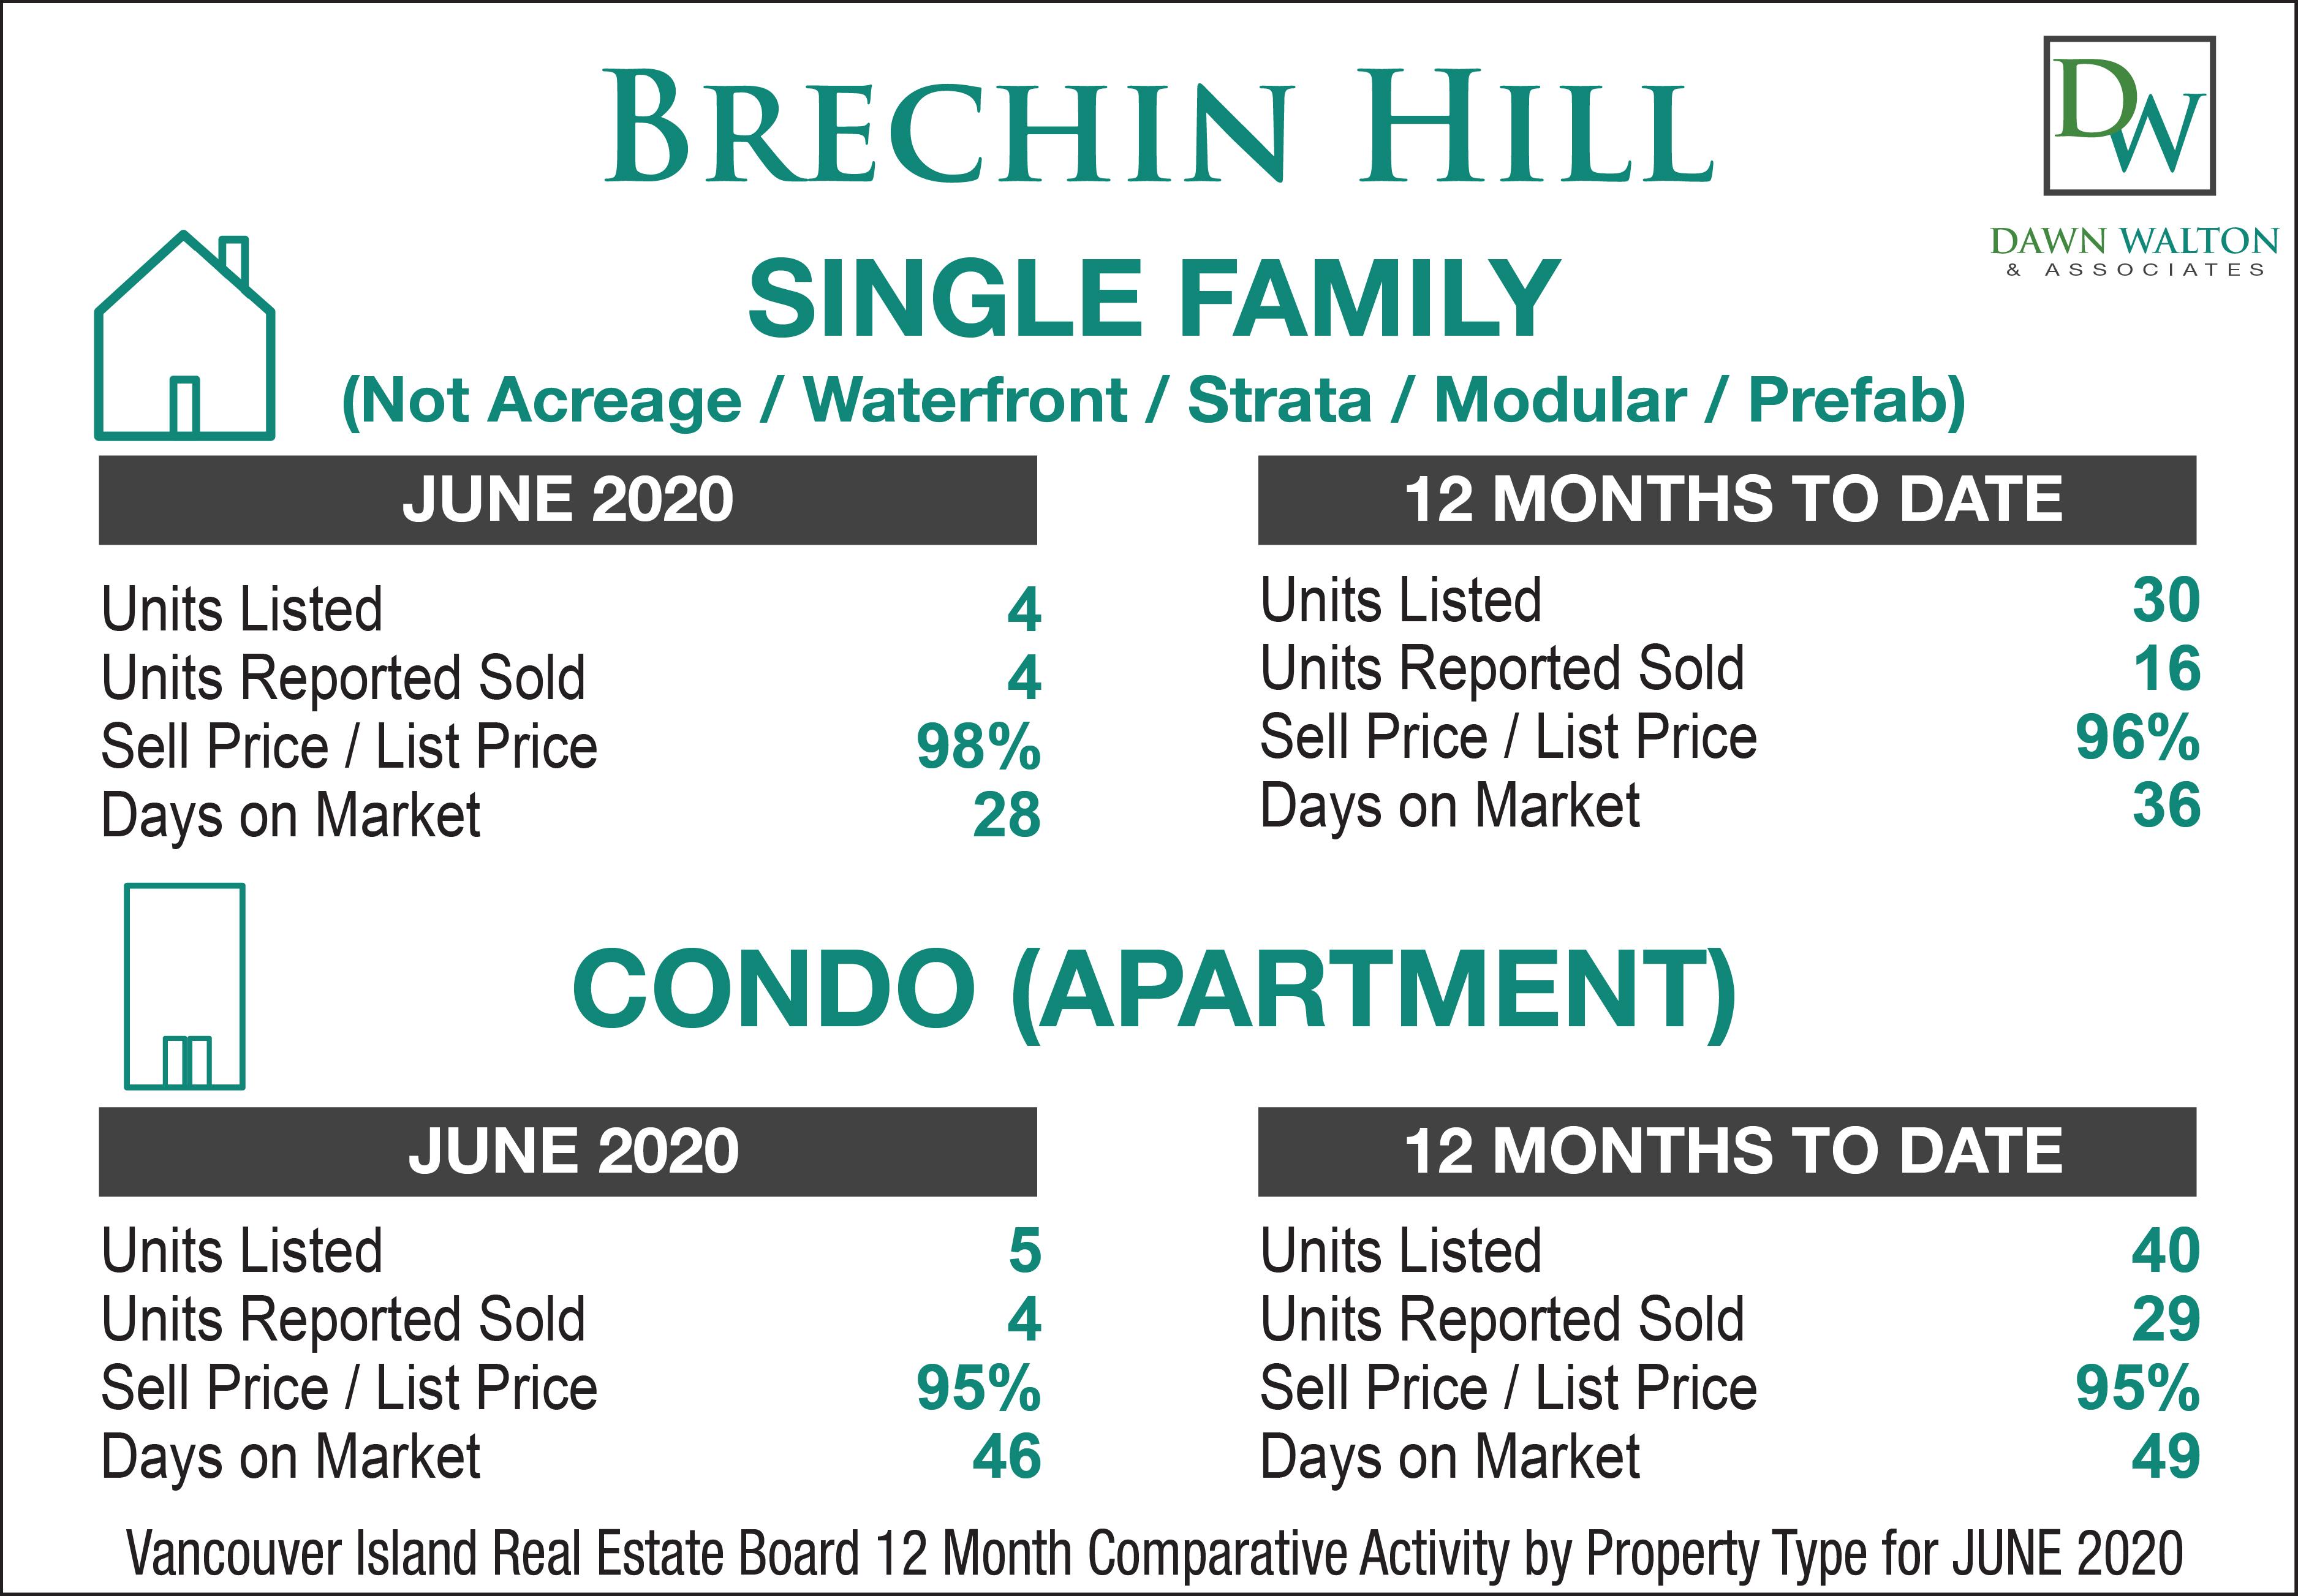 Brechin Hill Real Estate Market Stats June 2020 - Nanaimo Realtor Dawn Walton